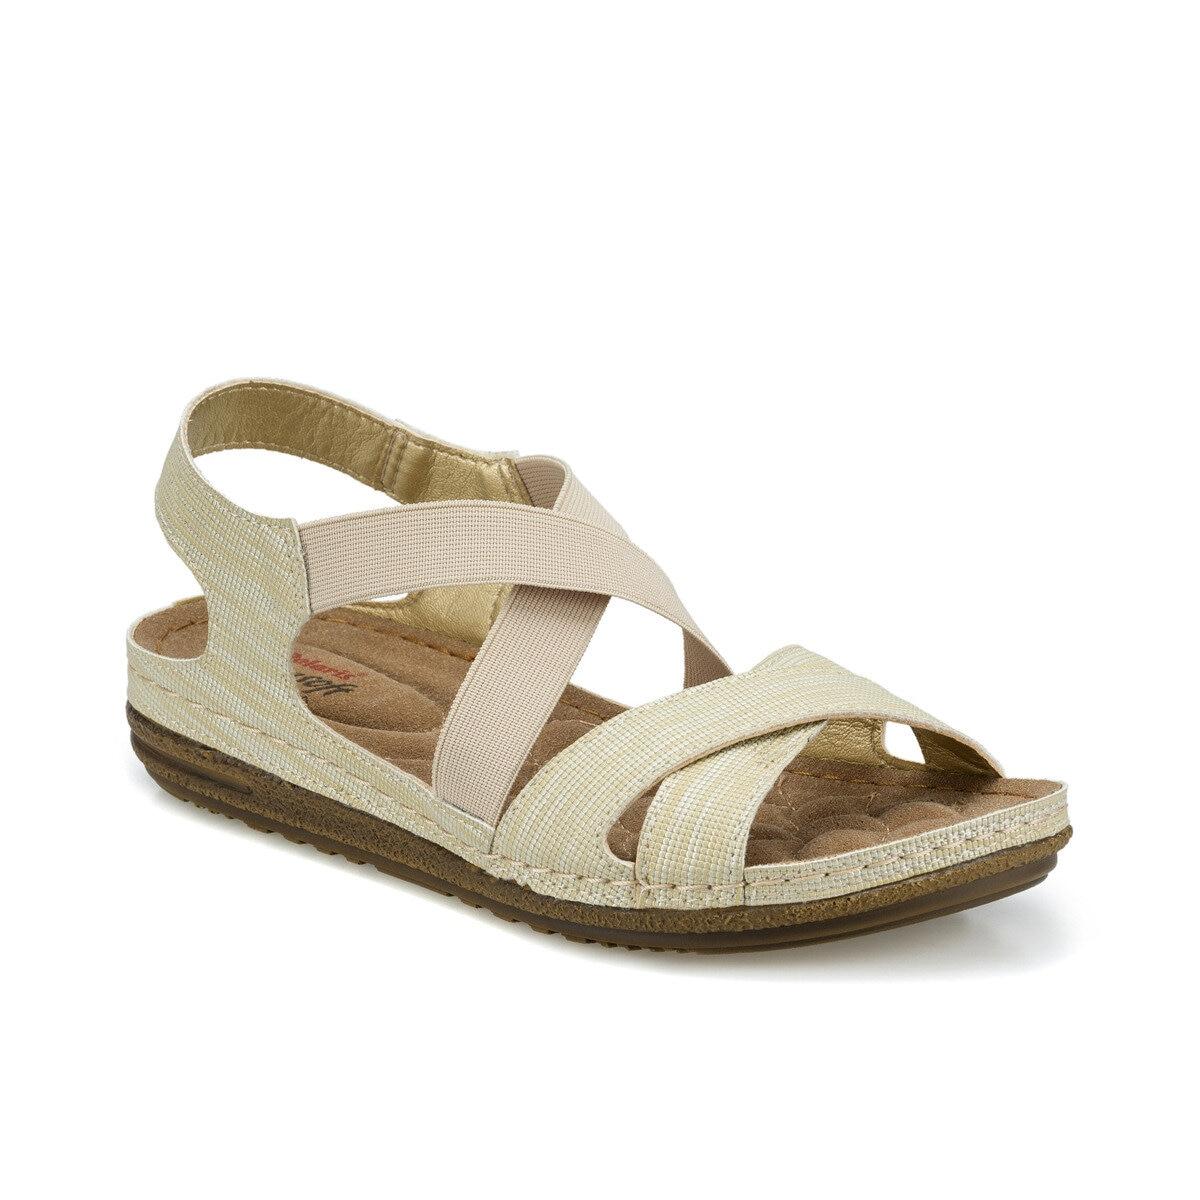 FLO 161164.Z sandalias de mujer Beige Polaris VIISENANTIN, oferta, sexy, rojo, negro, Cuero brillante, sandalias de verano para mujer, cristal de piedras preciosas, sandalias de tacón grueso, correa de tobillo